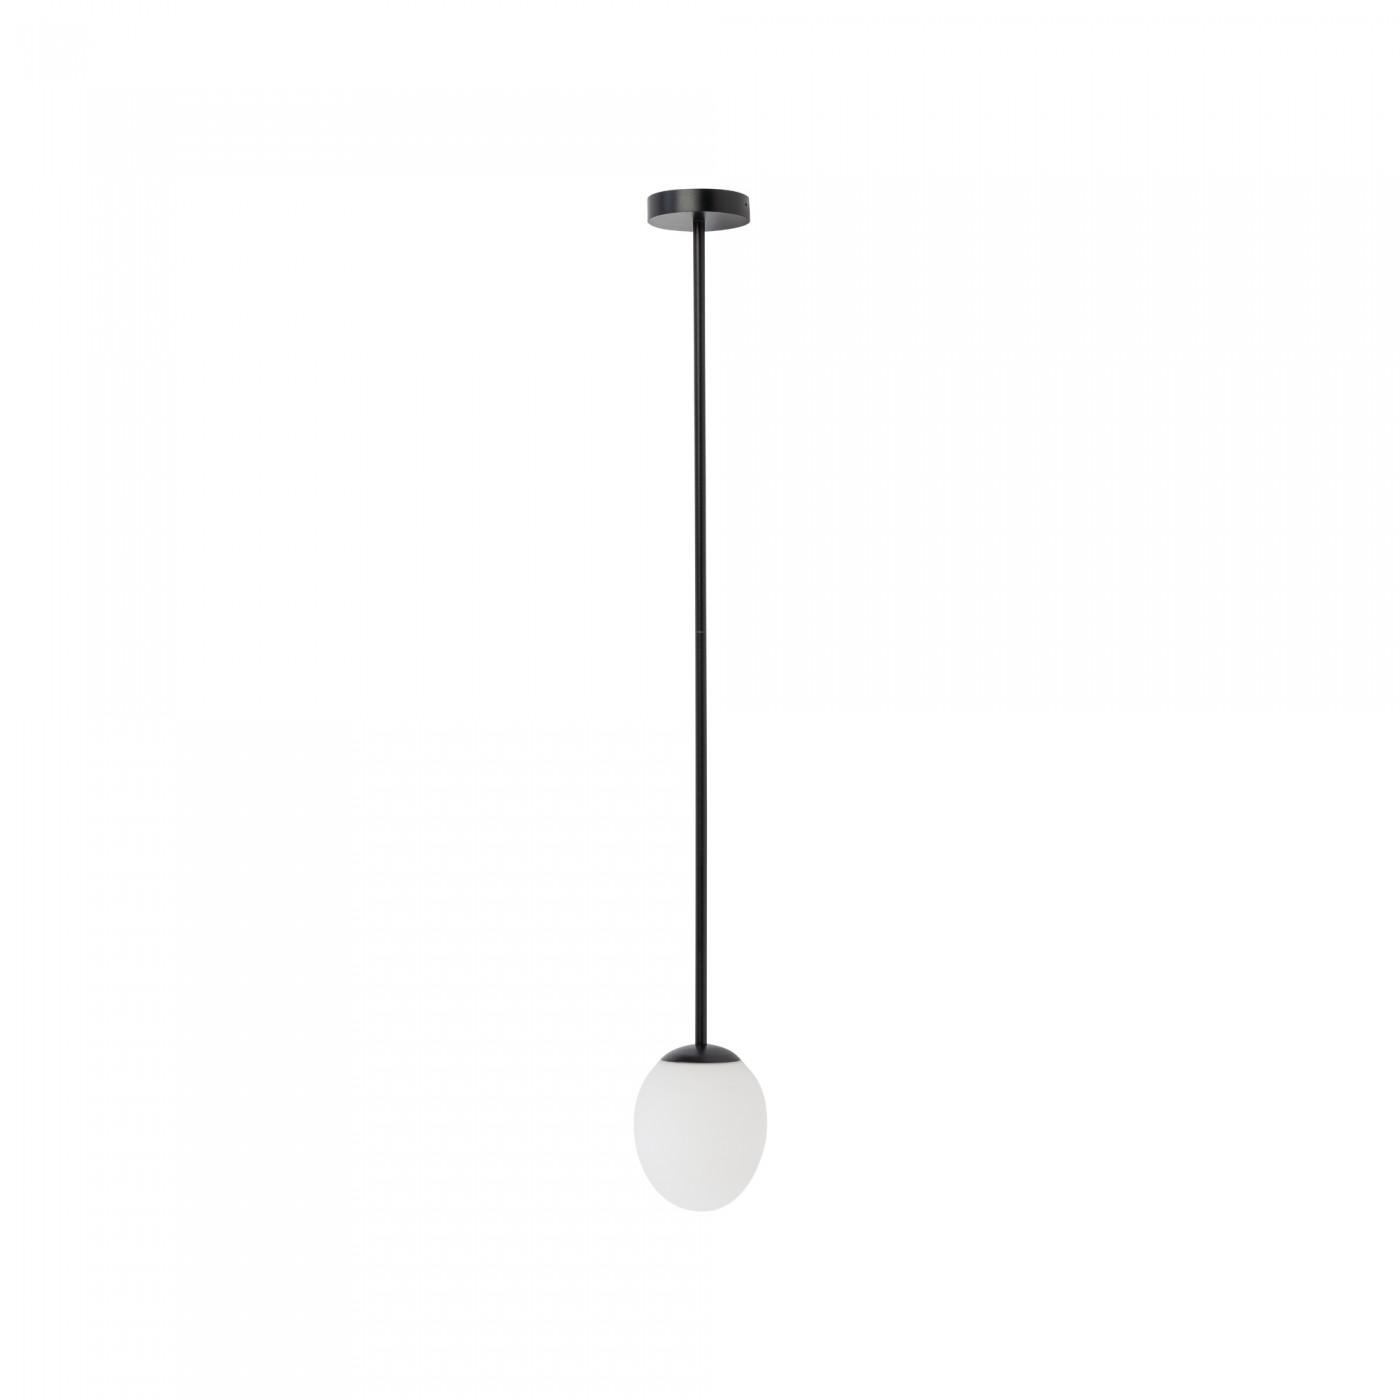 ICE EGG A black 8124 Nowodvorski Lighting